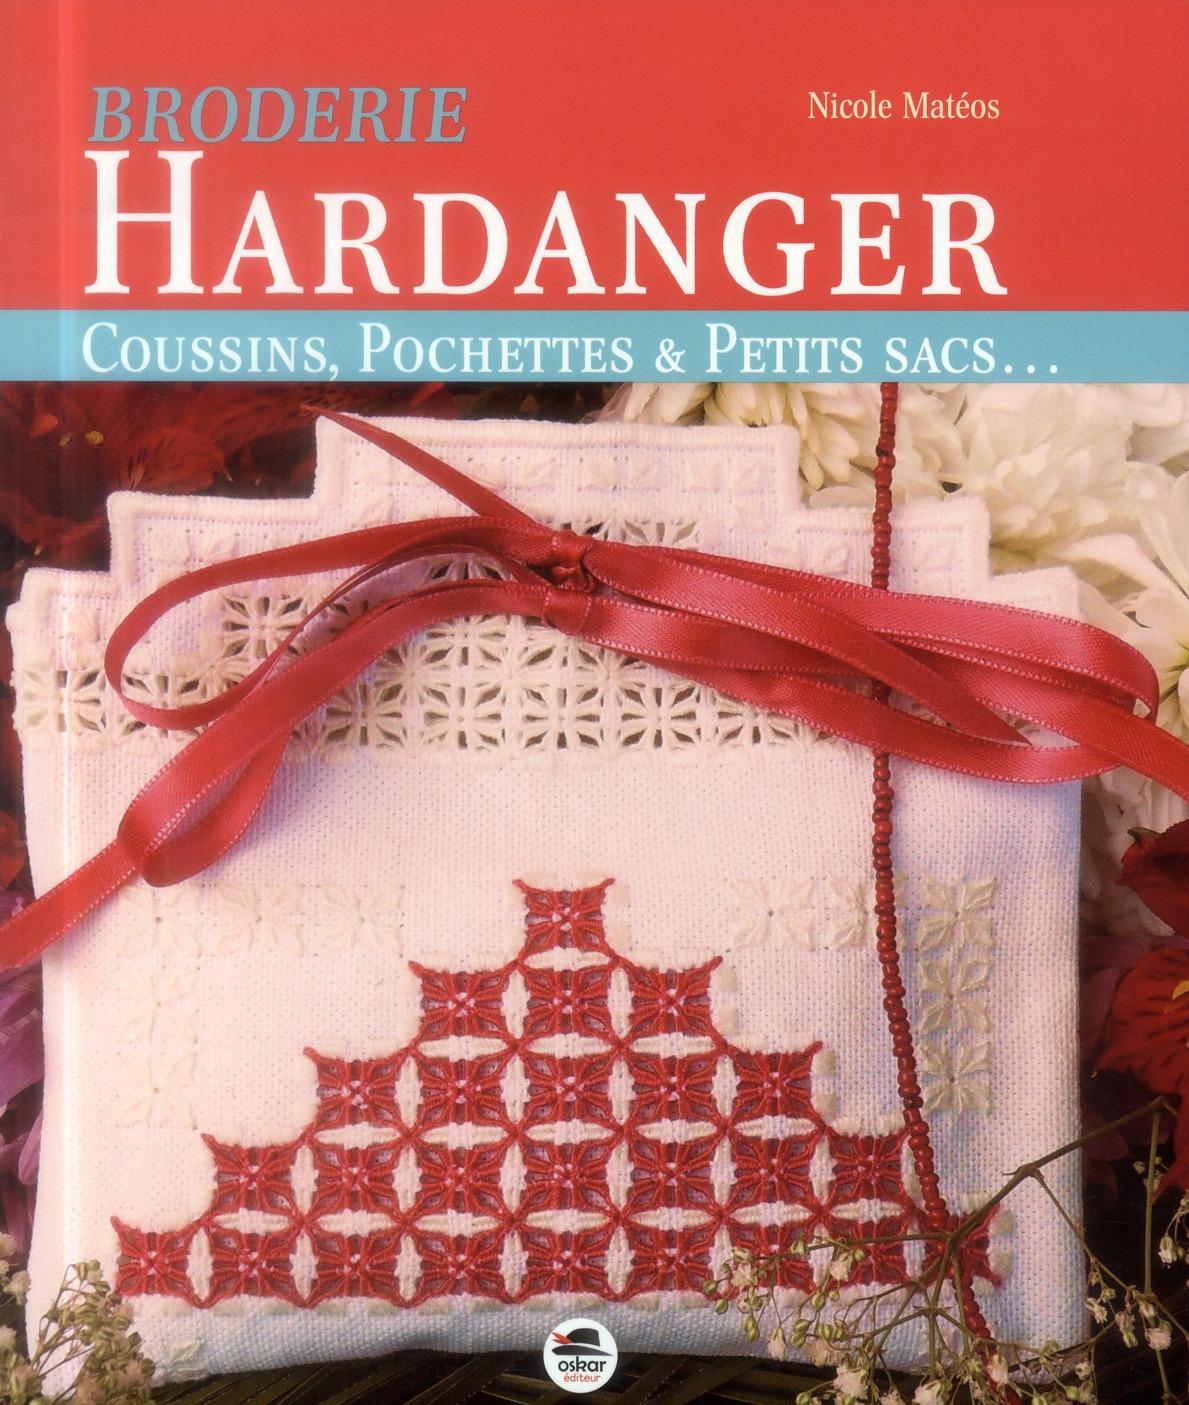 BRODERIE HARDANGER : COUSSINS, POCHETTES ET PETITS SACS